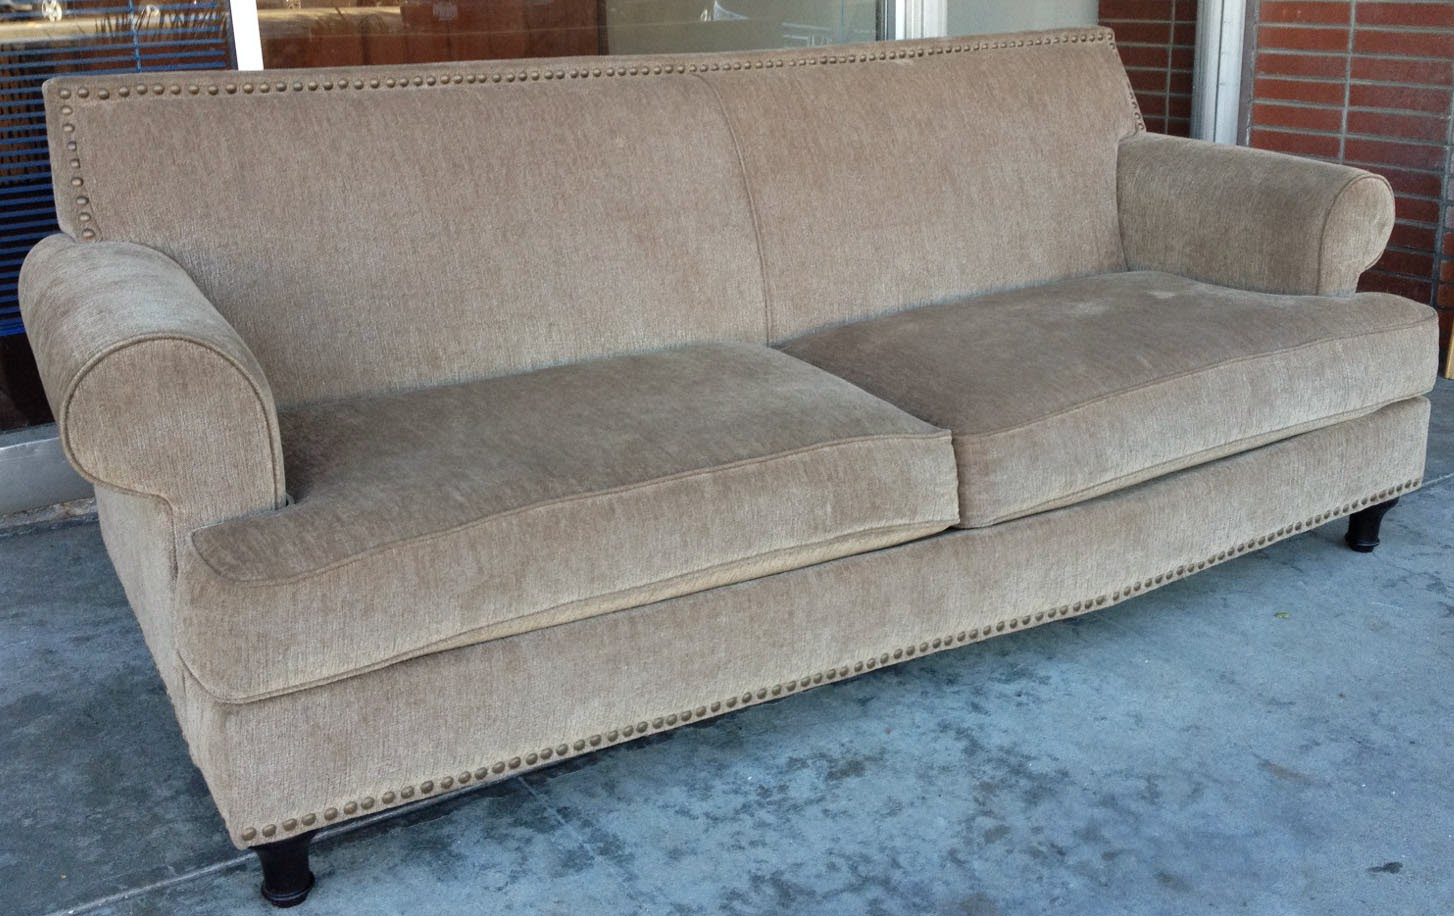 Uhuru furniture collectibles sold metal studded sofa 165 for Studded sofa